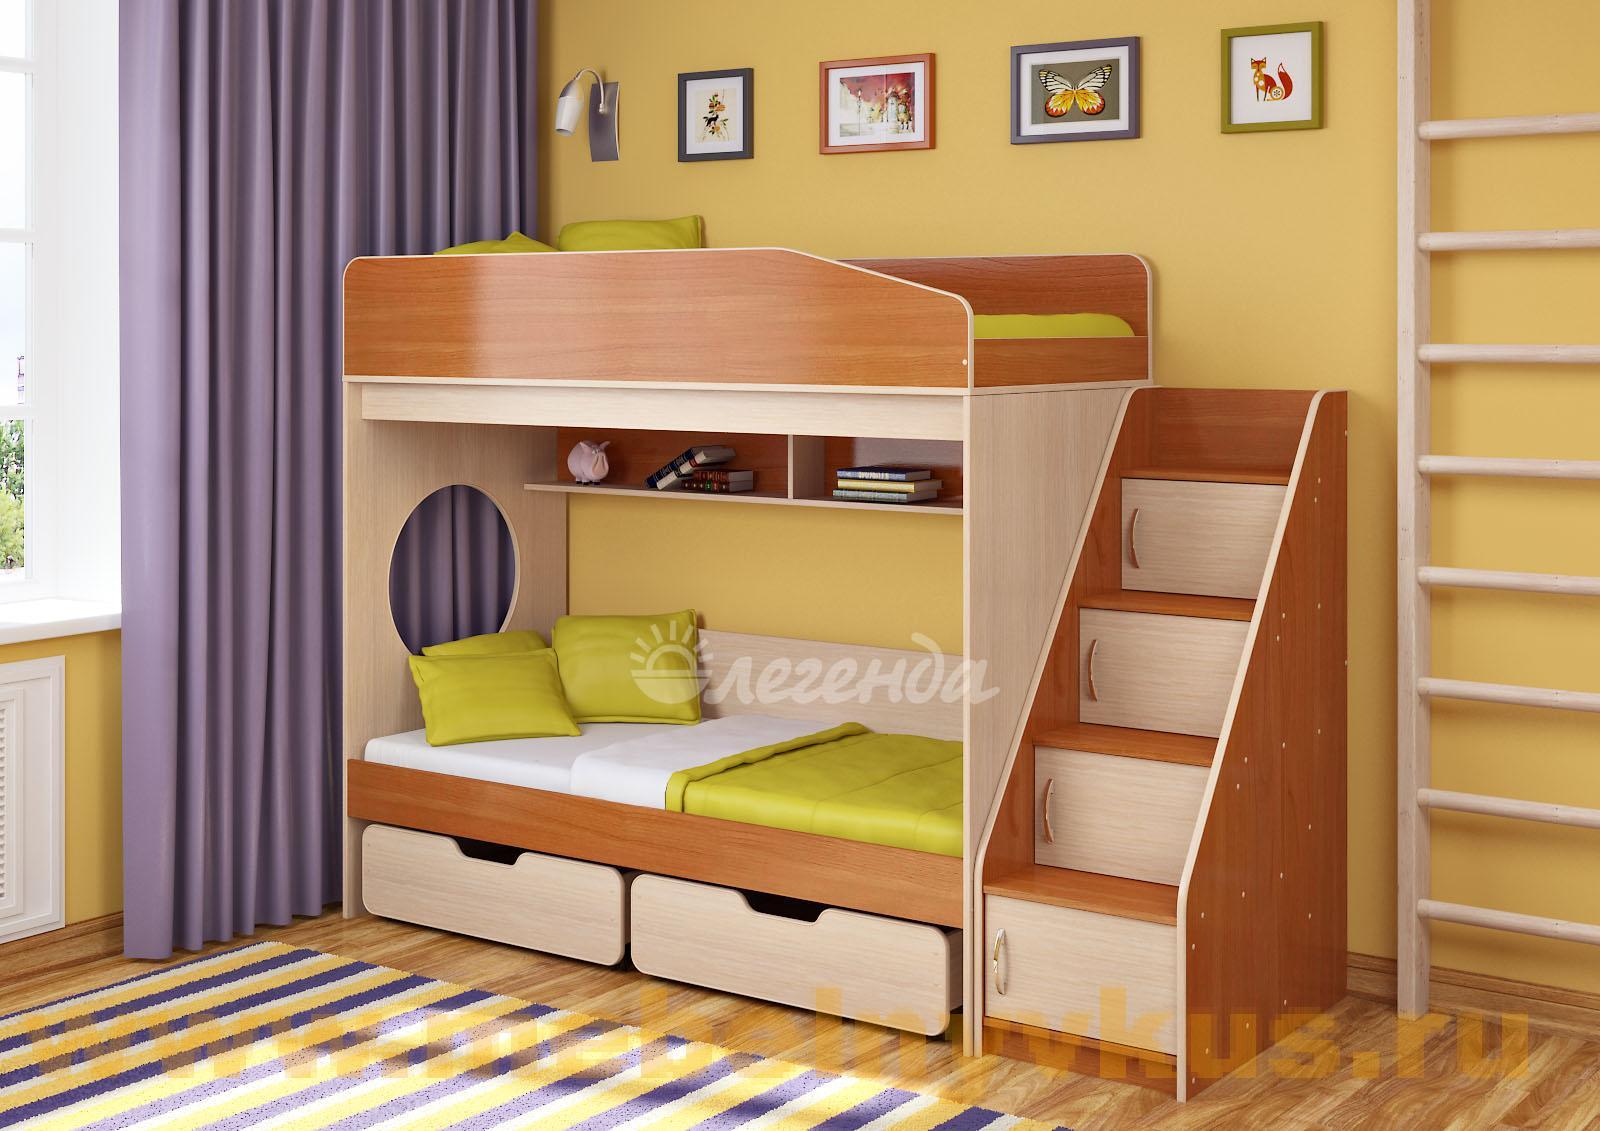 Двухъярусные кровати для подростков фото